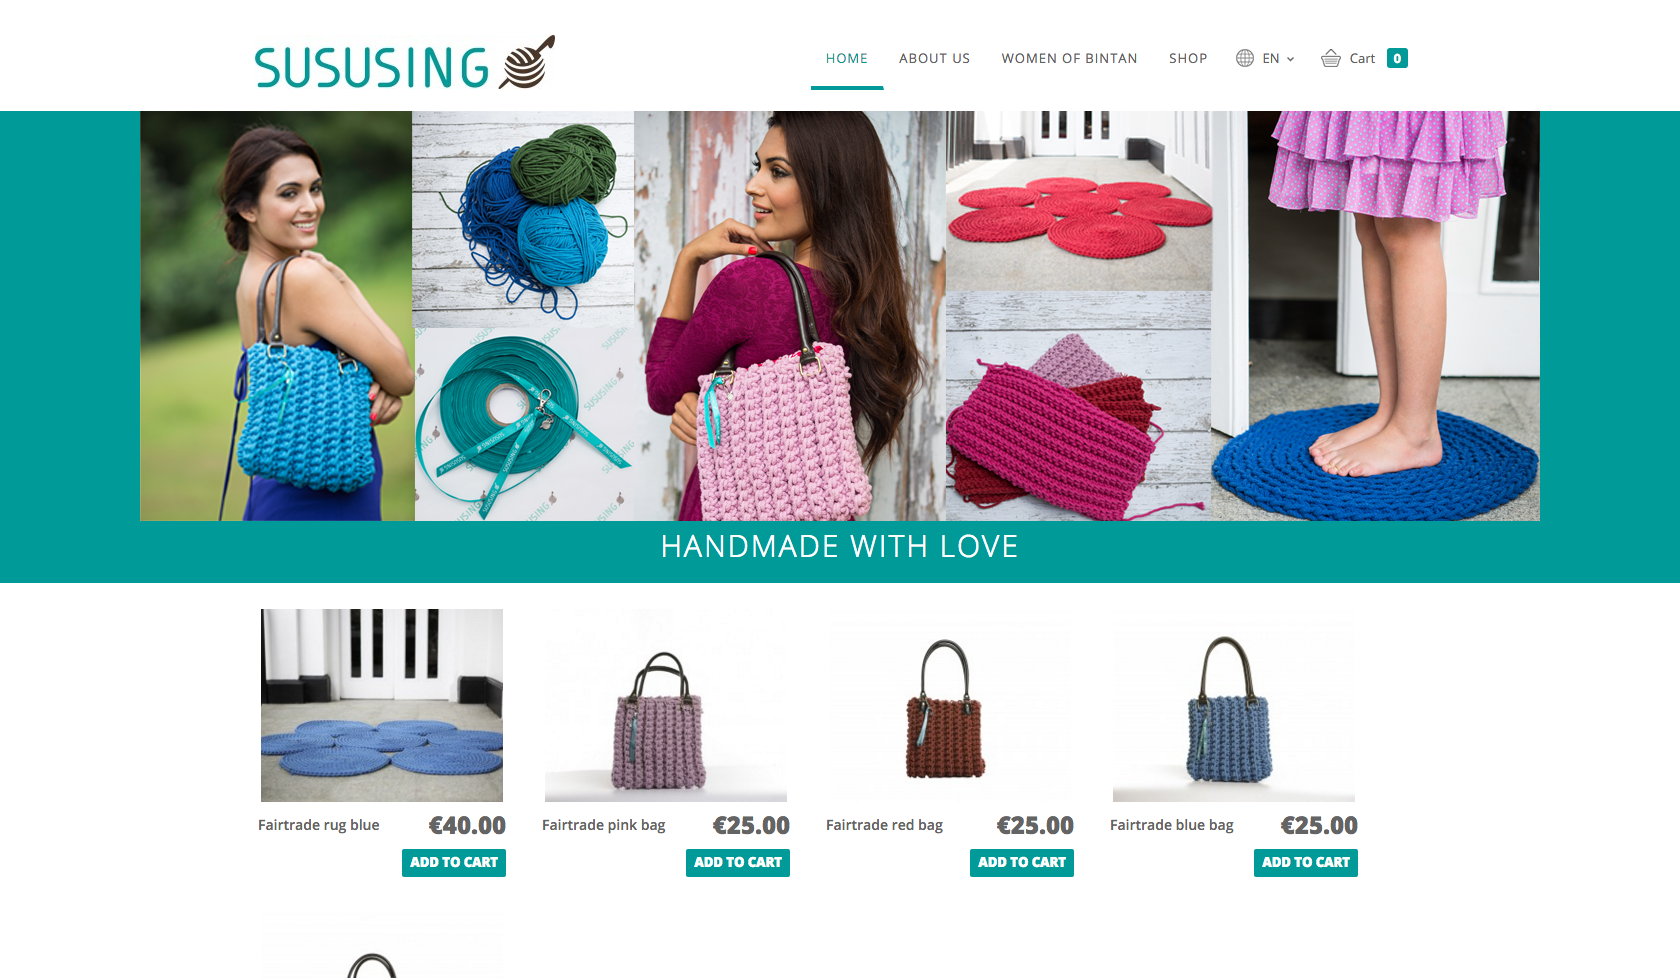 Fairtrade Tassen Online : Web voor fairtrade tassen seo cursus amsterdam